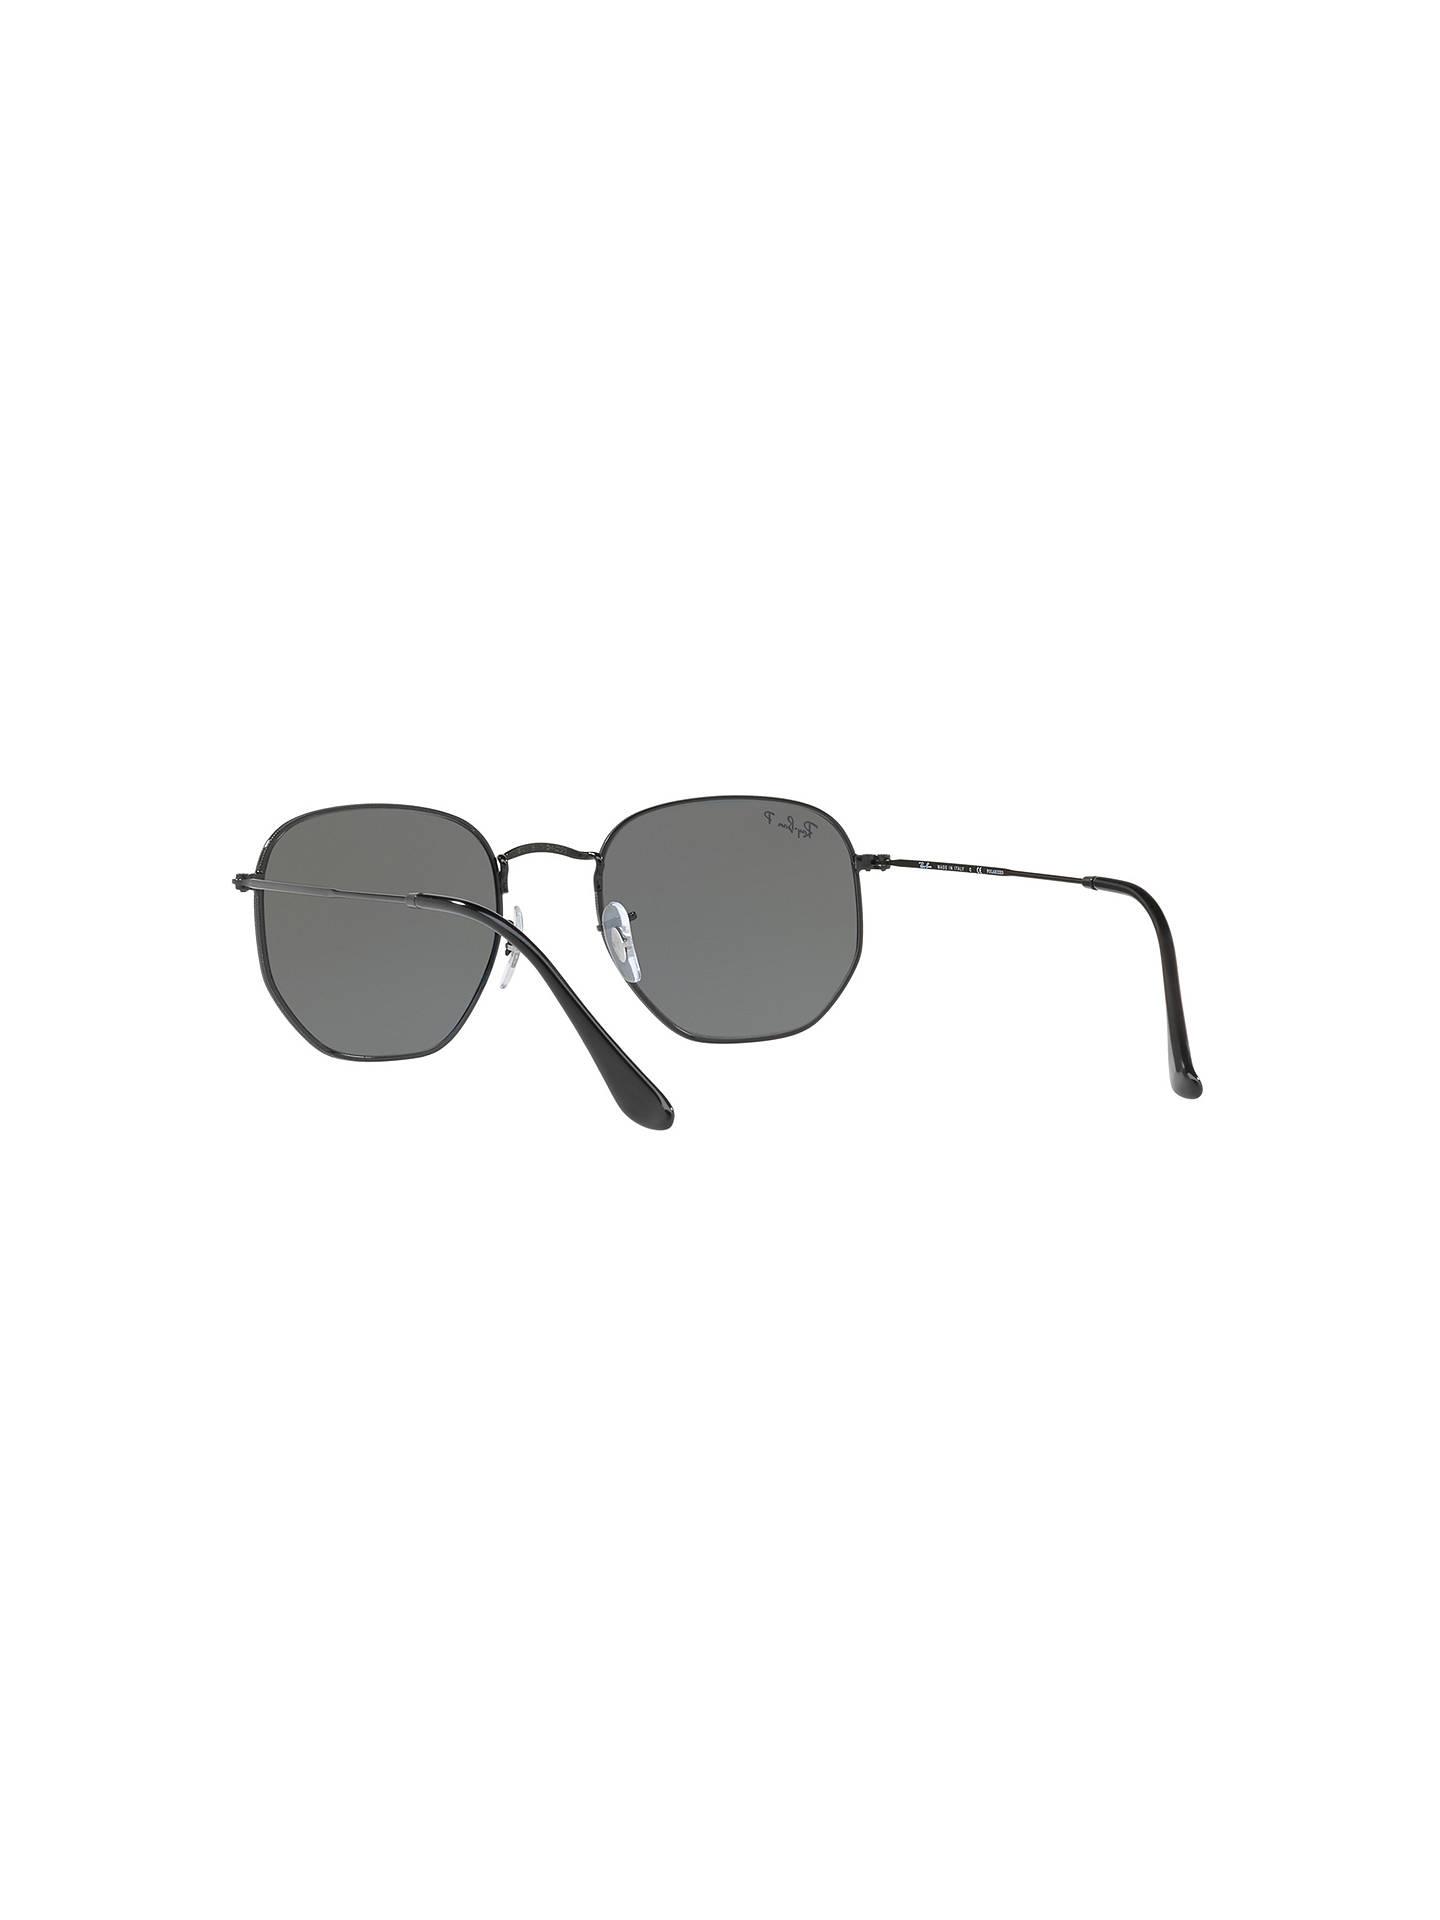 7cb58aaf0e Ray-Ban RB3548N Polarised Hexagonal Flat Lens Sunglasses at John ...